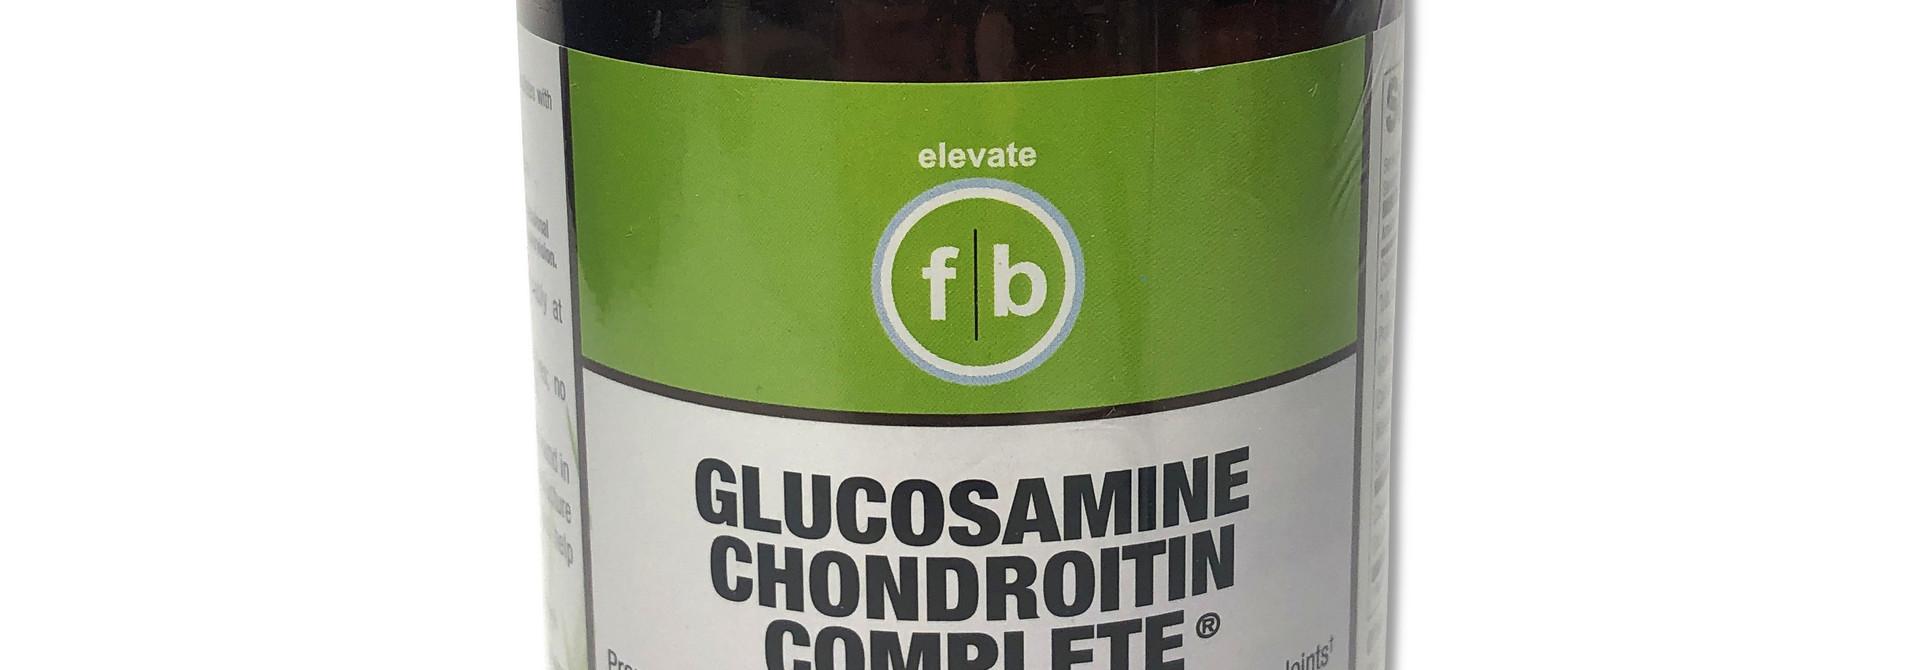 Glucosamine Chondroitin Complete